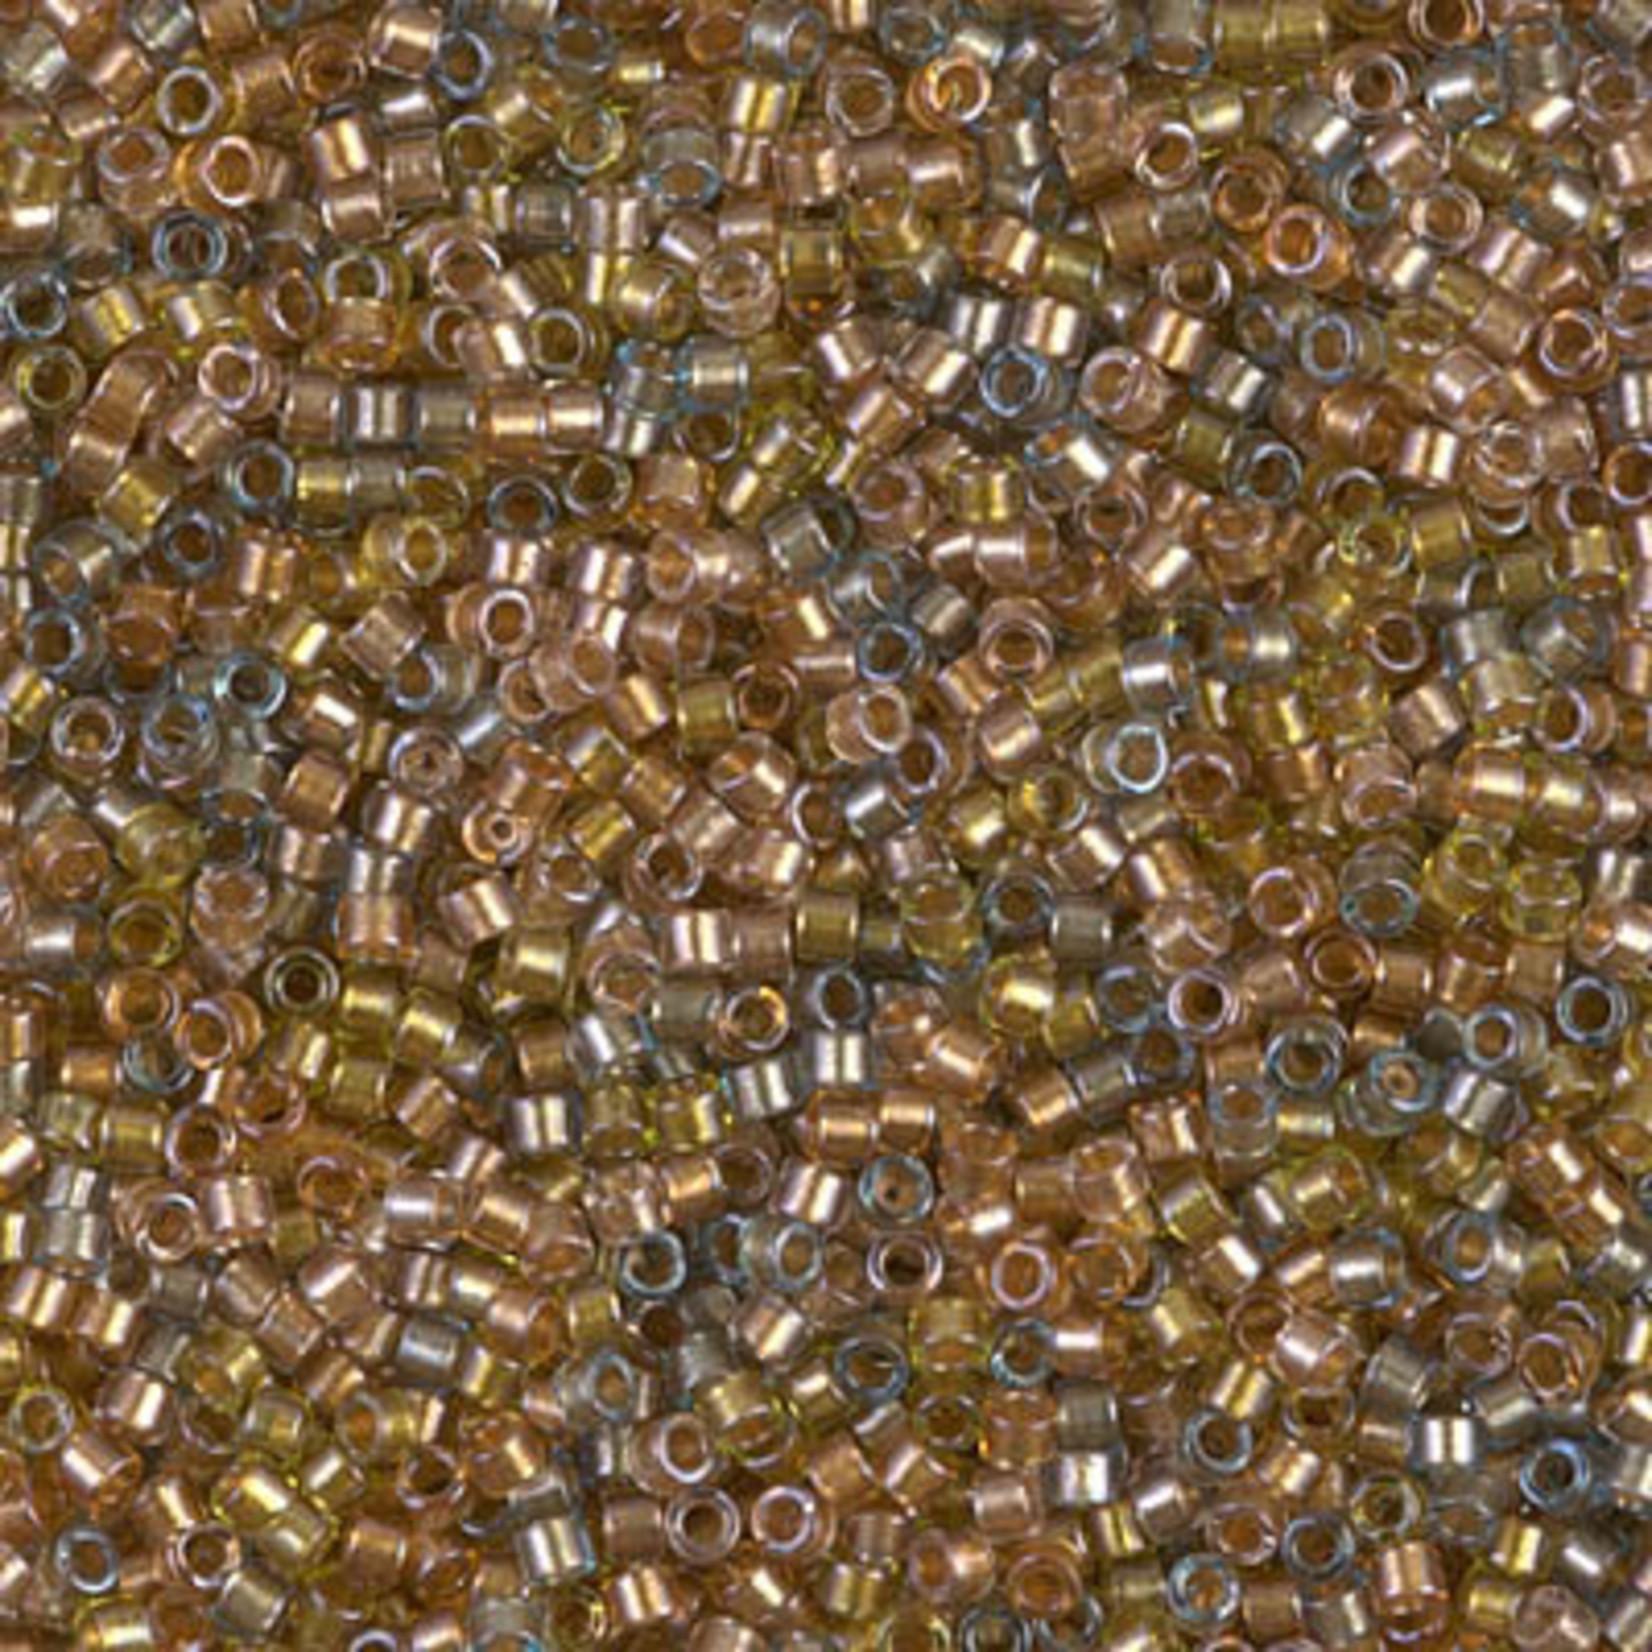 Miyuki 7.2 GM DB0981 11/0 Delica: Taupe/Amber Mix ICL* (D) (APX 1400 PCS)